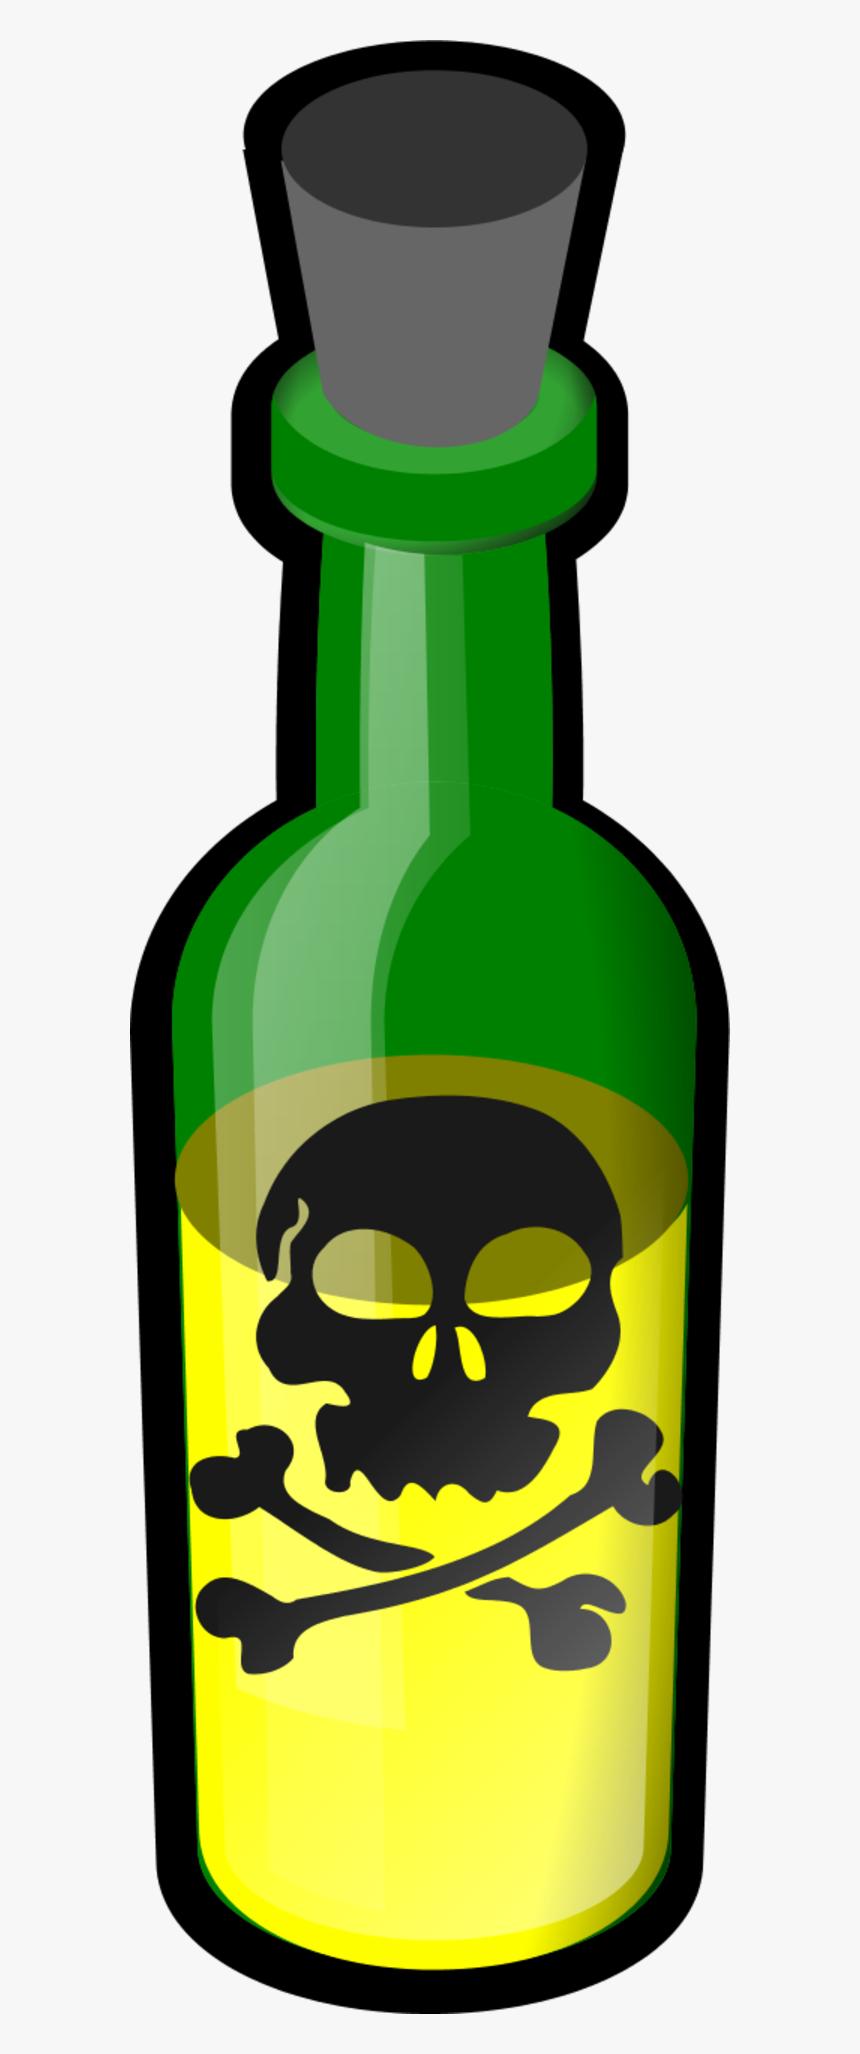 Poison Png Free File Download - Poison Bottle Png, Transparent Png, Free Download